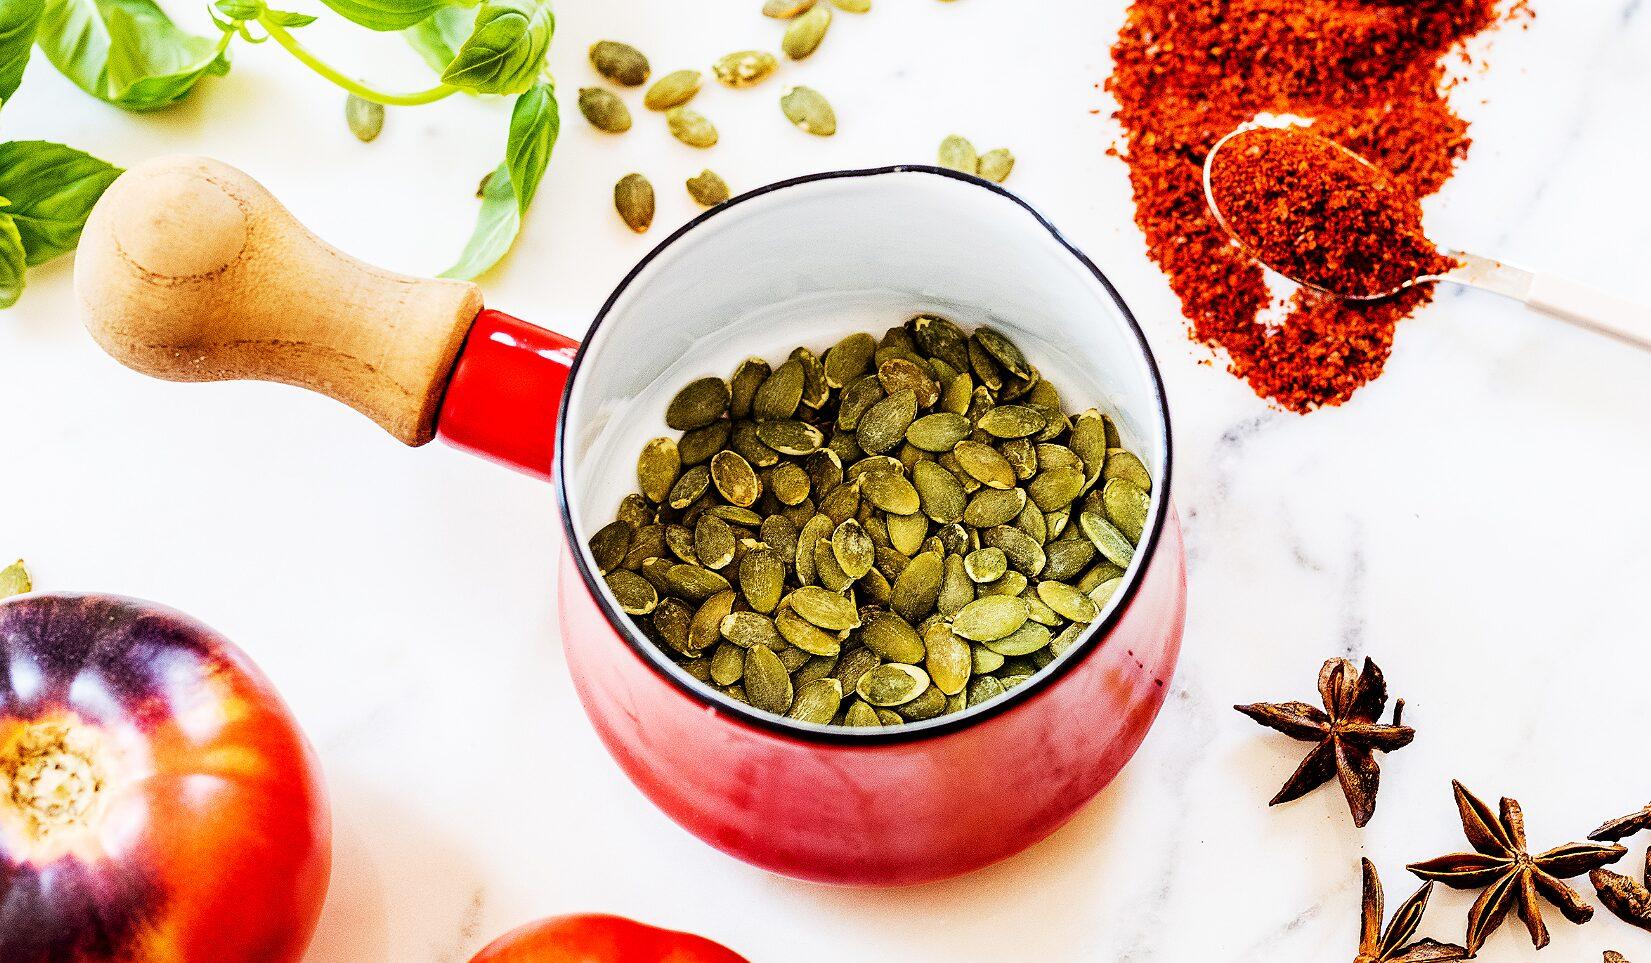 The Art of the Garnish: 5 Best Food Garnishes